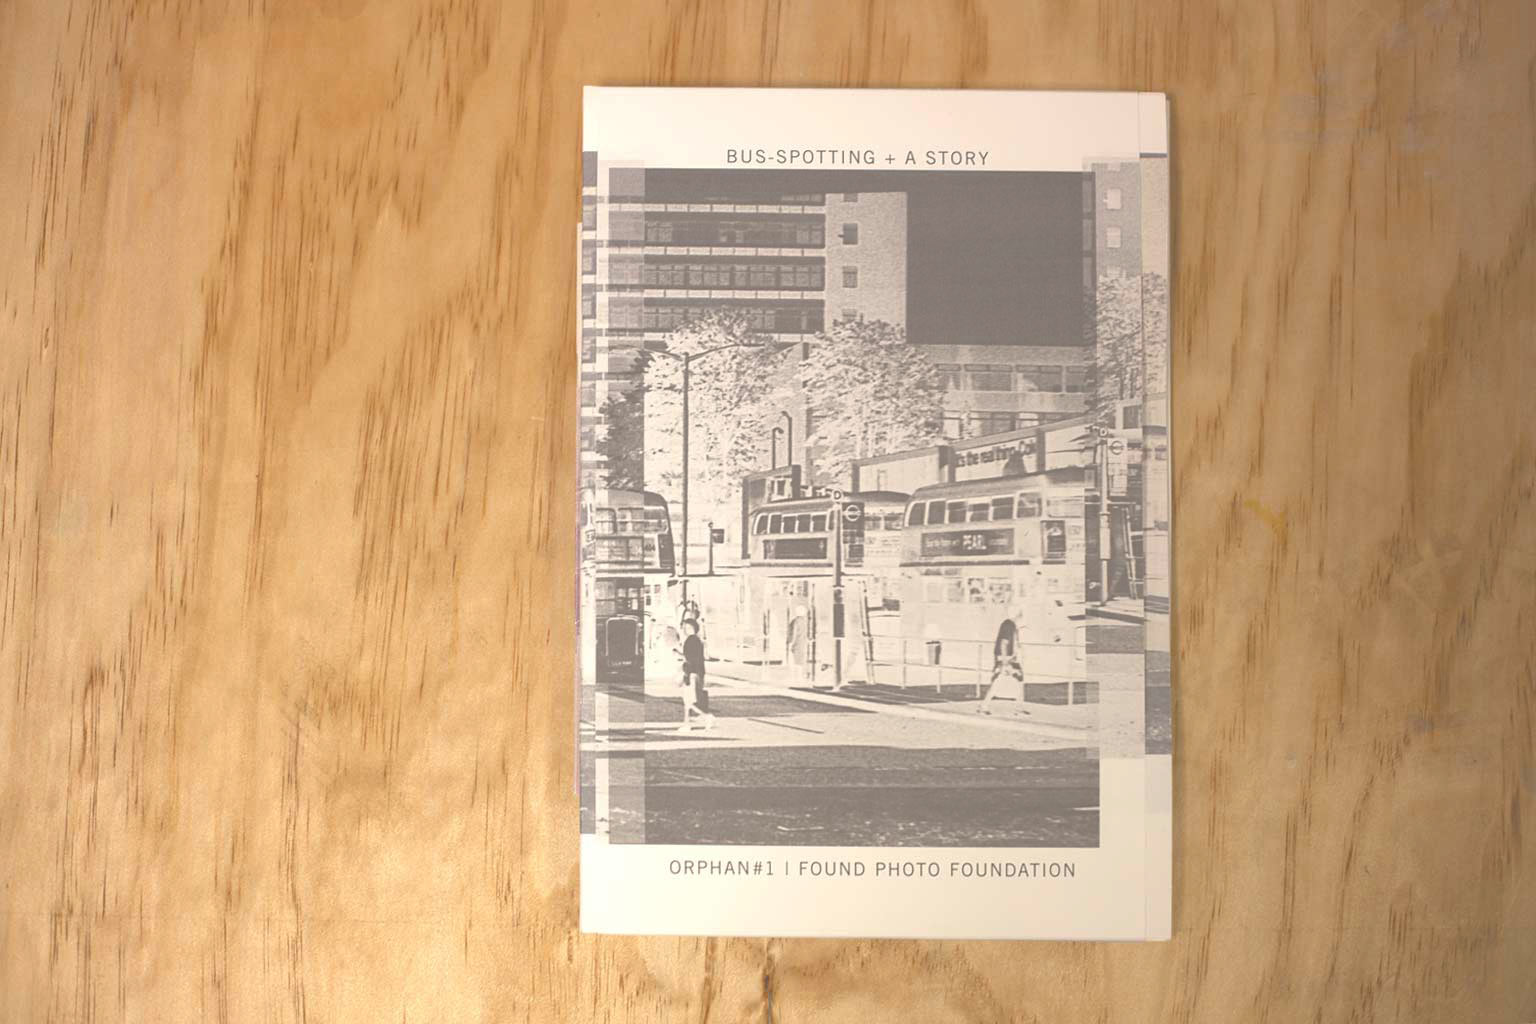 paula-roush-bus-spotting-photobook-msdm-publications-orphan1-144